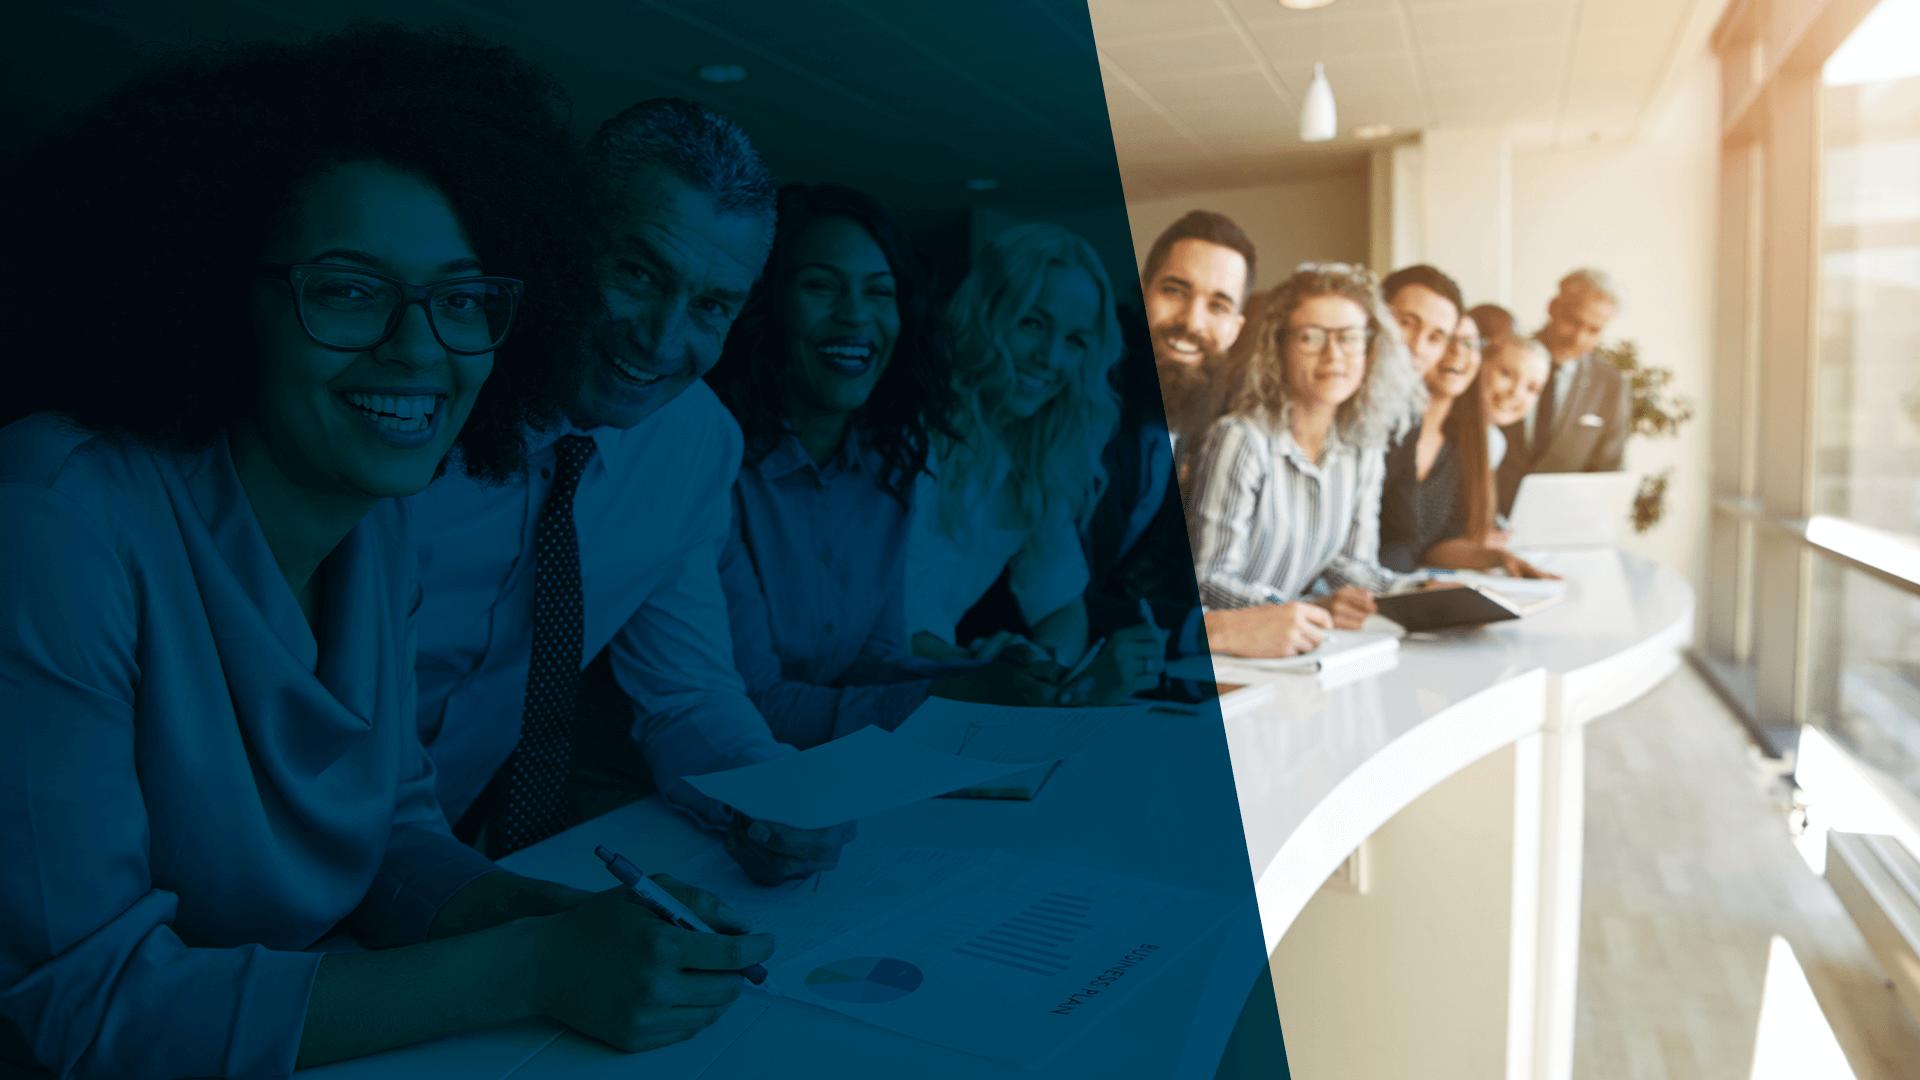 persoperm Leistungen - Arbeitgebermarke stärken